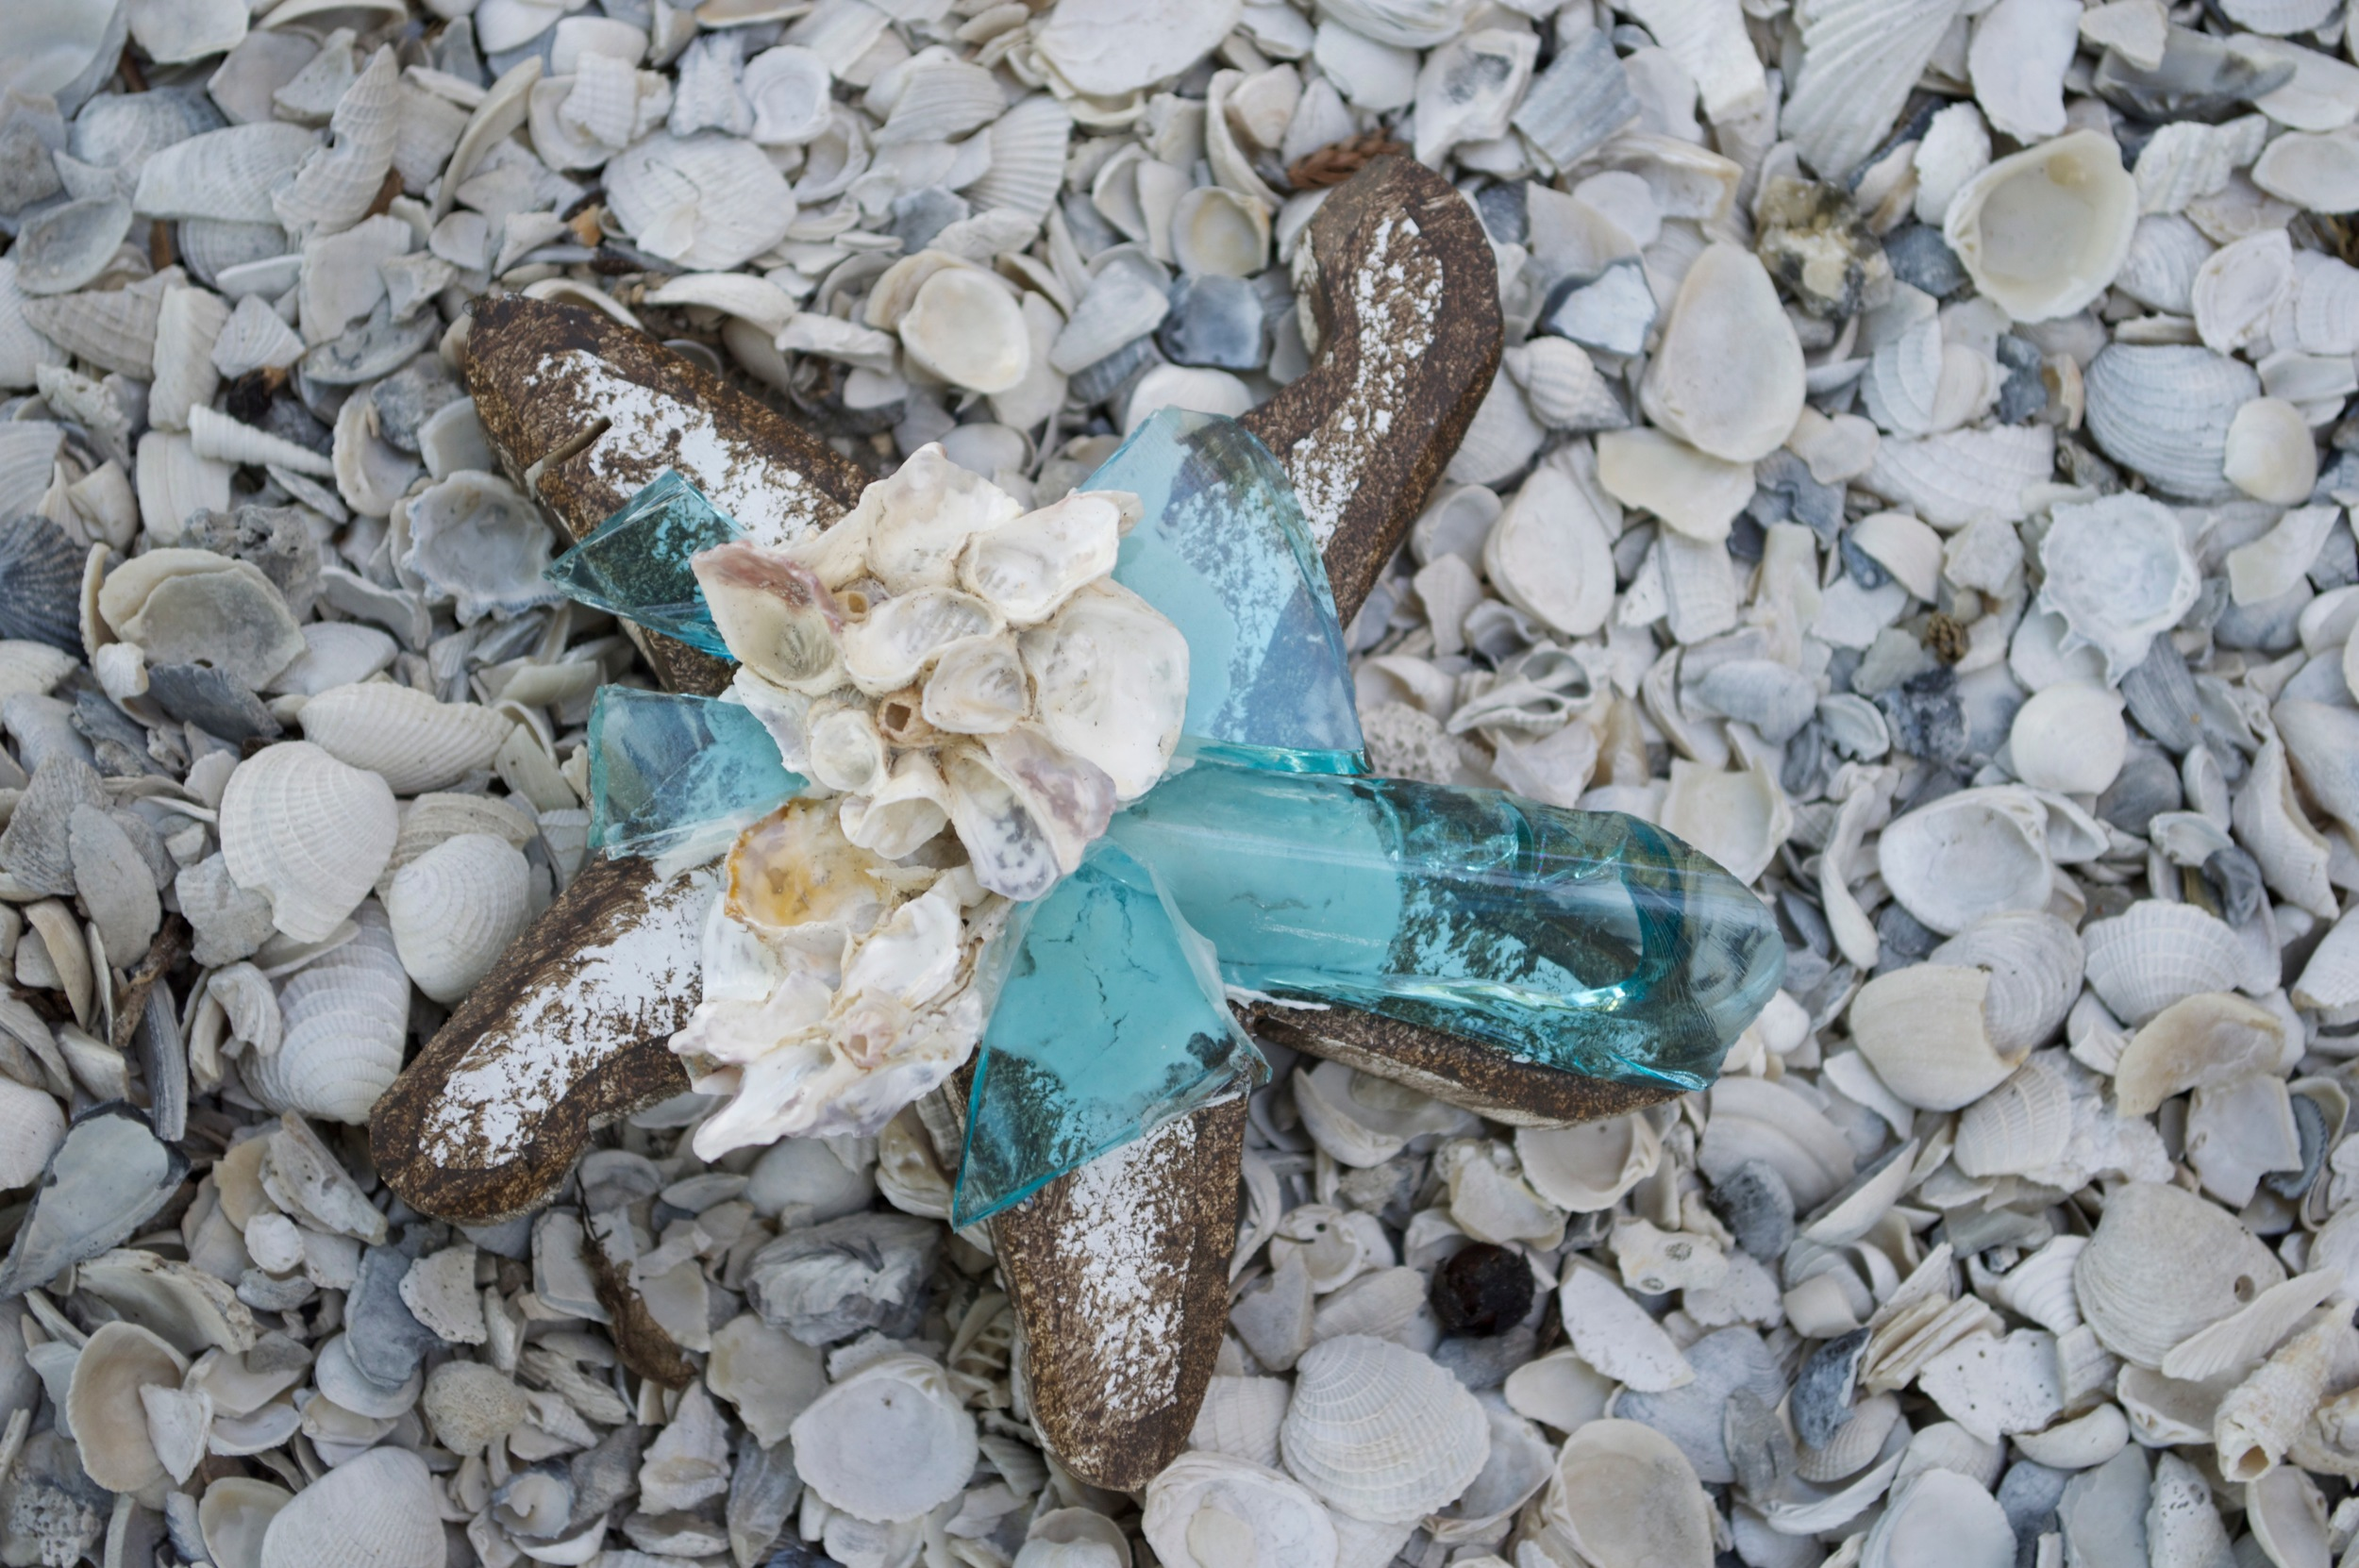 "Beach Art - Sm. Star Fish - wood, glass, shells - 3/4"" thick, 5"" wide - $18"